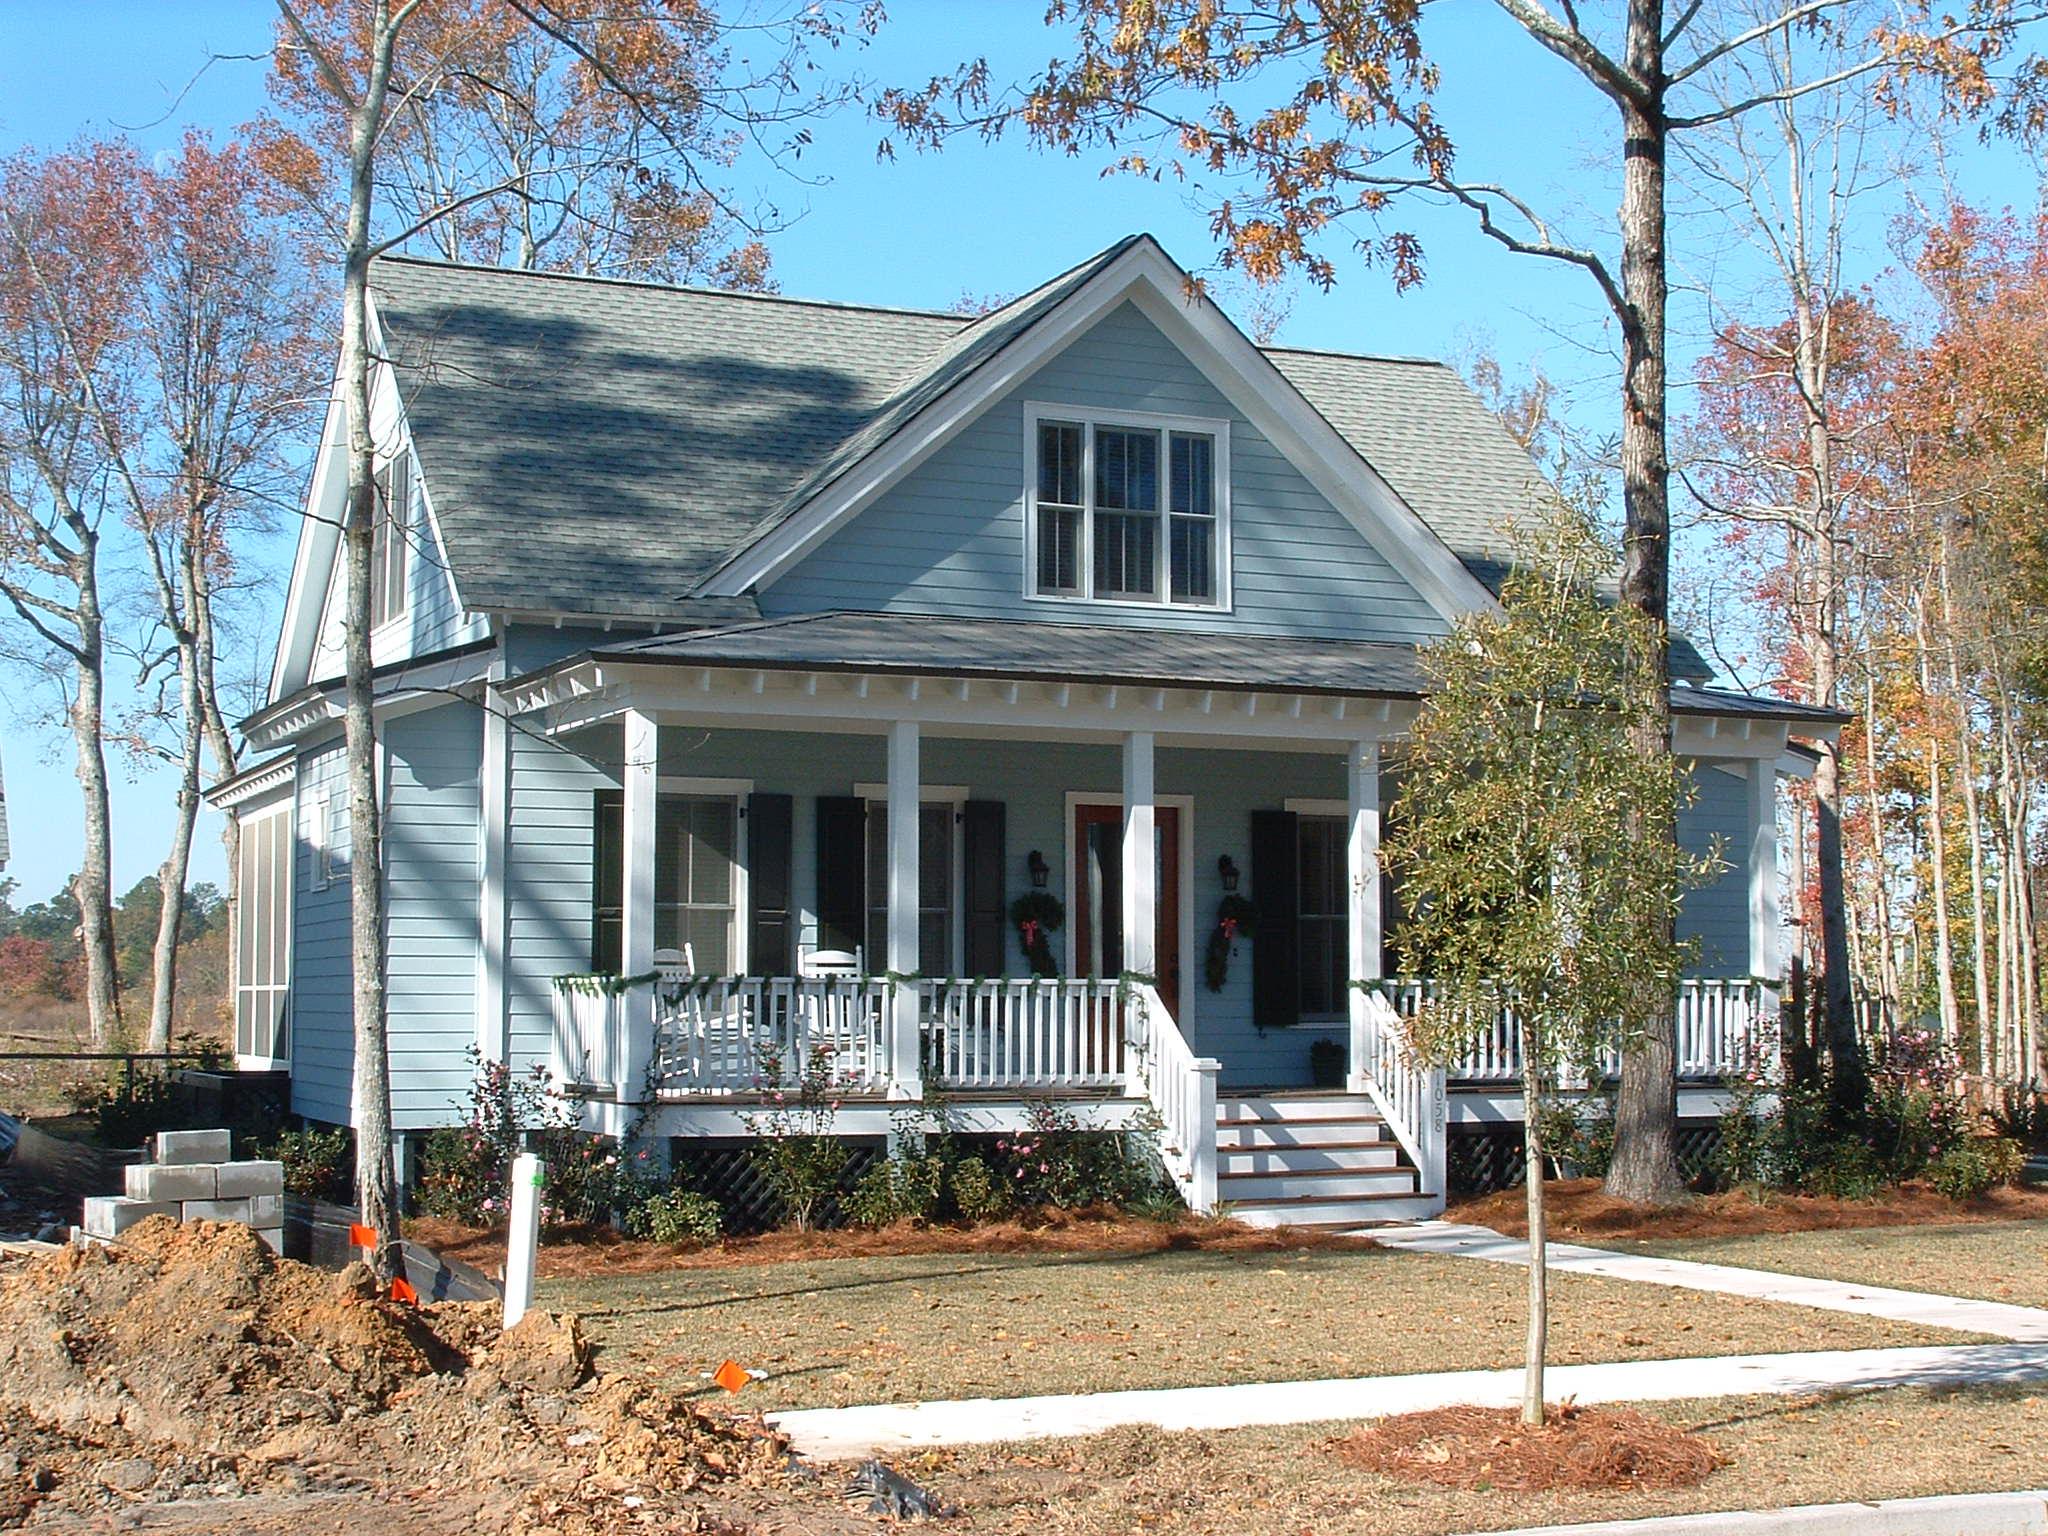 Amelia Island's Custom Home Builder on slater house plans, slaughter house plans, glessner house plans, provencal house plans,